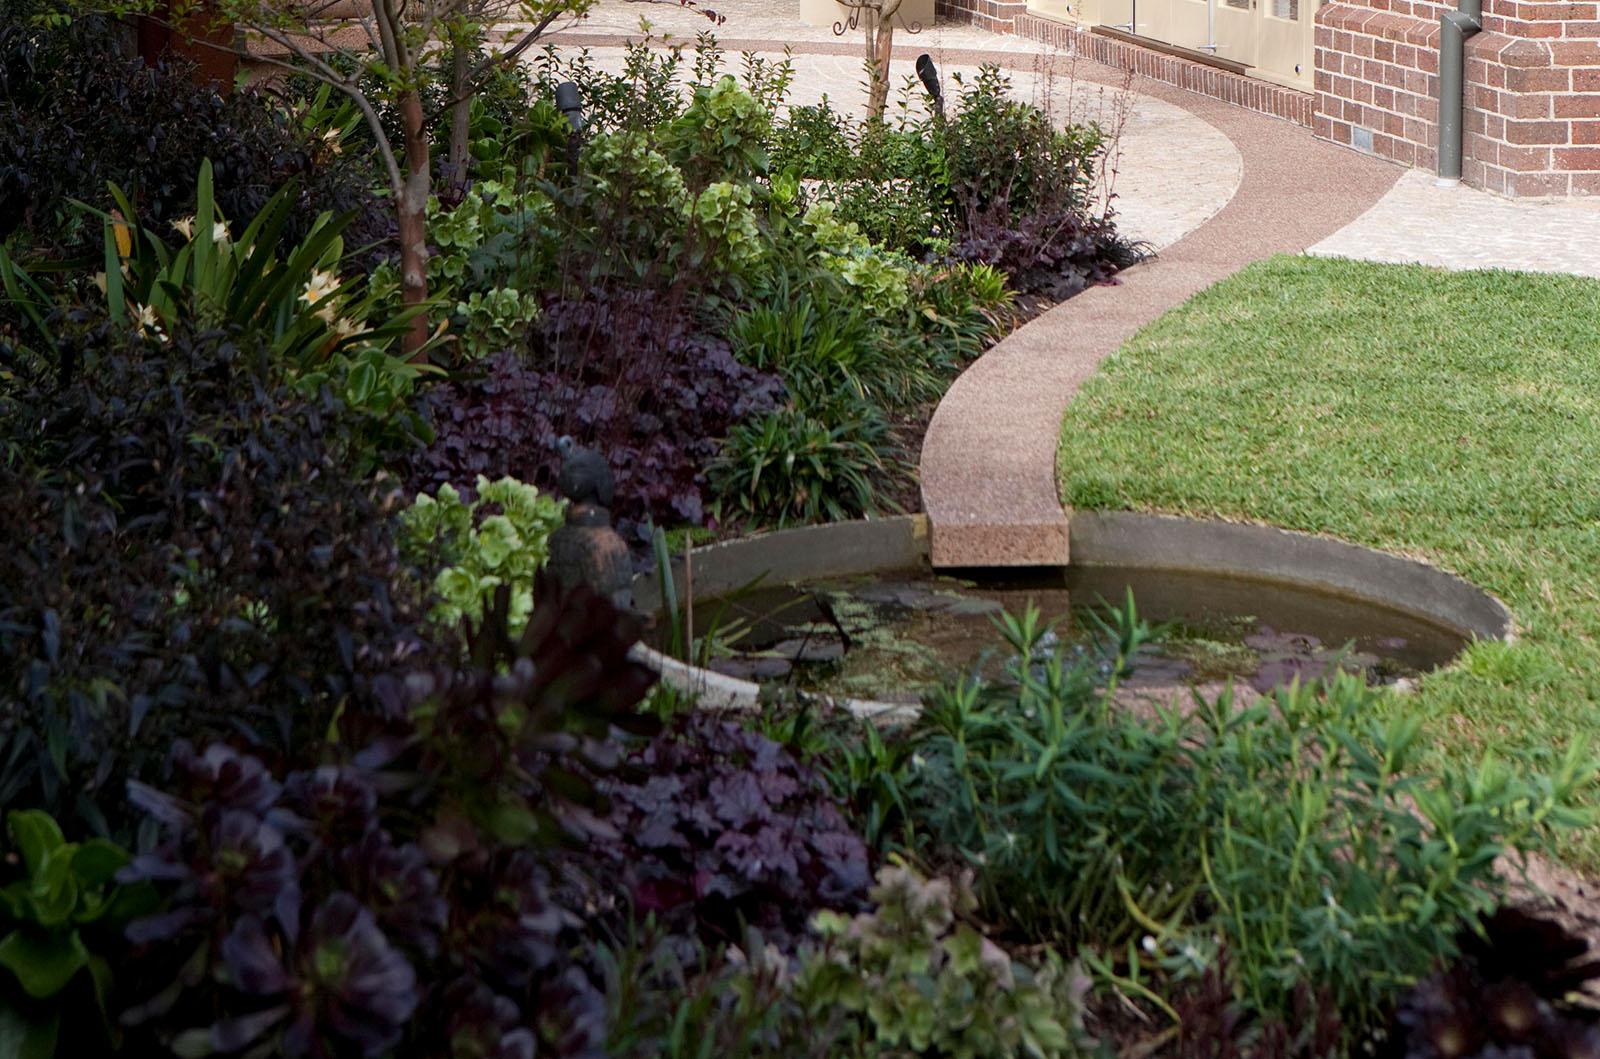 Sculptured Garden_0005s_0001_Hughes 9